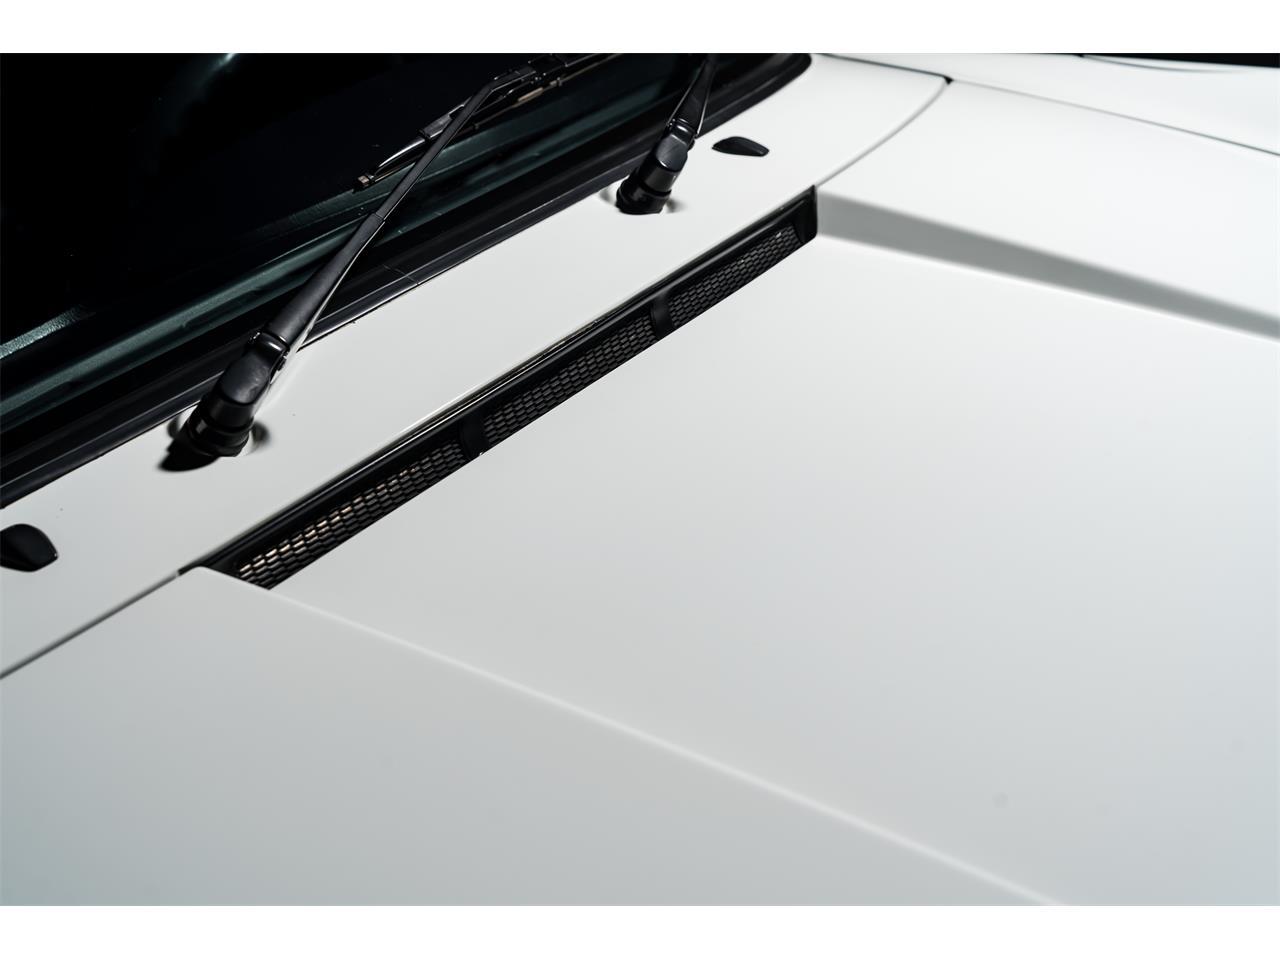 Large Picture of '89 Porsche 930 Turbo located in Pontiac Michigan - $155,000.00 - QXI9